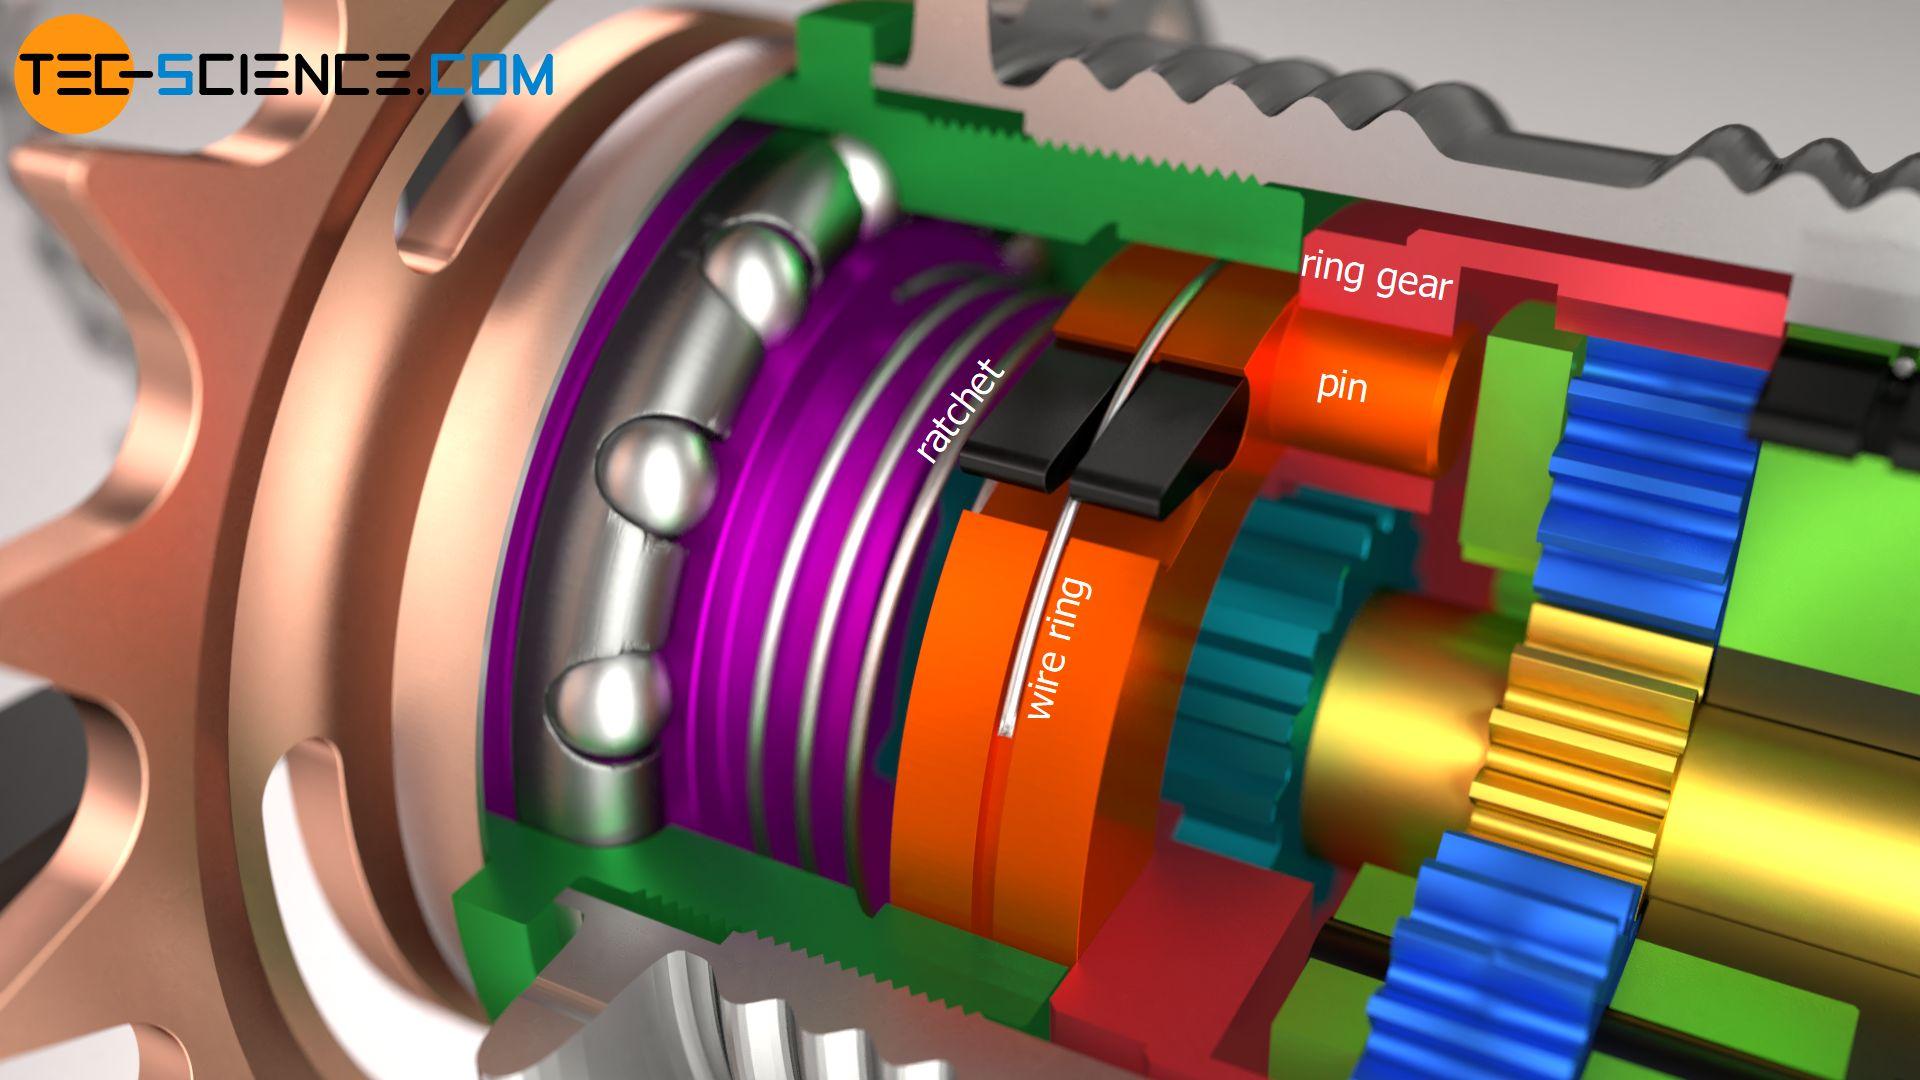 Overrunning clutch of a three-speed gear hub